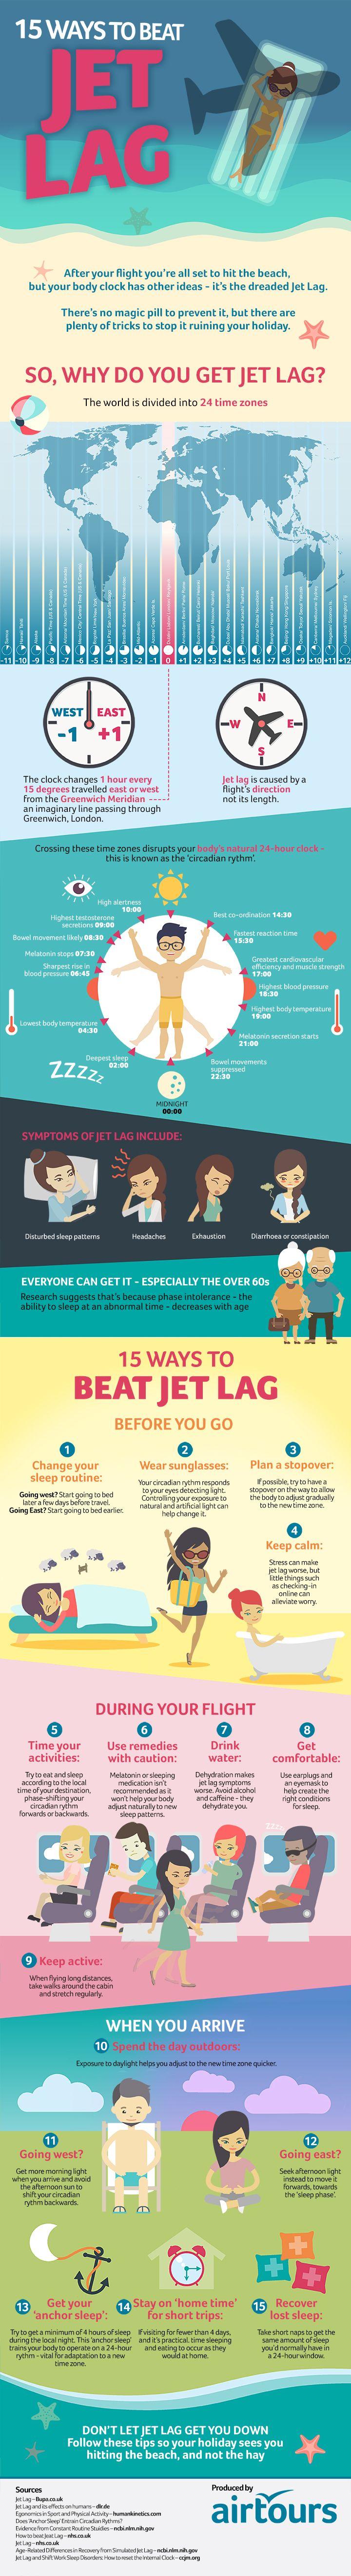 How to Beat Jet Lag #JetLag